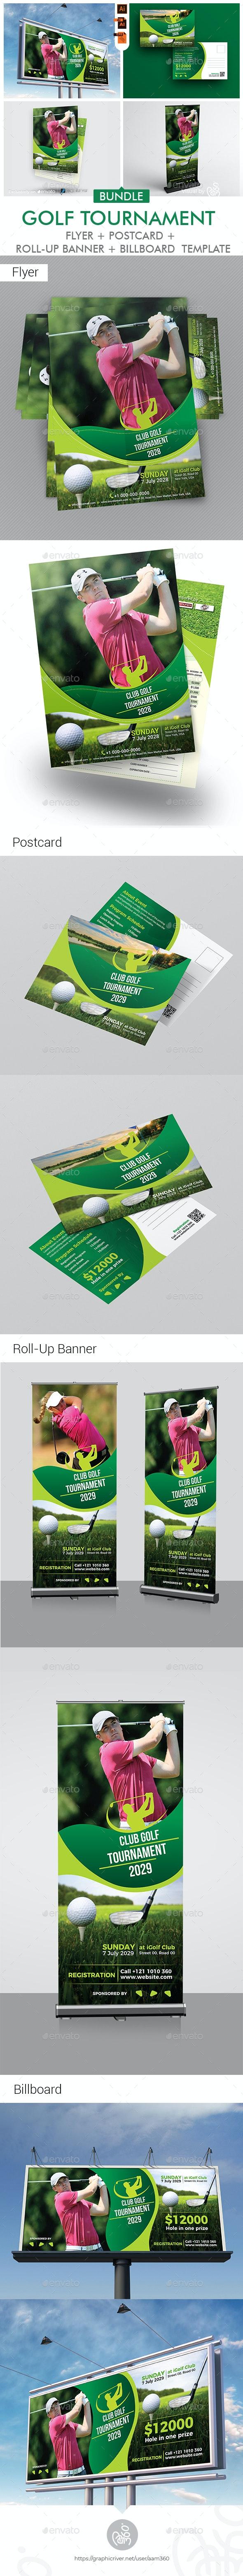 Golf Tournamet Print Template Bundle - Print Templates